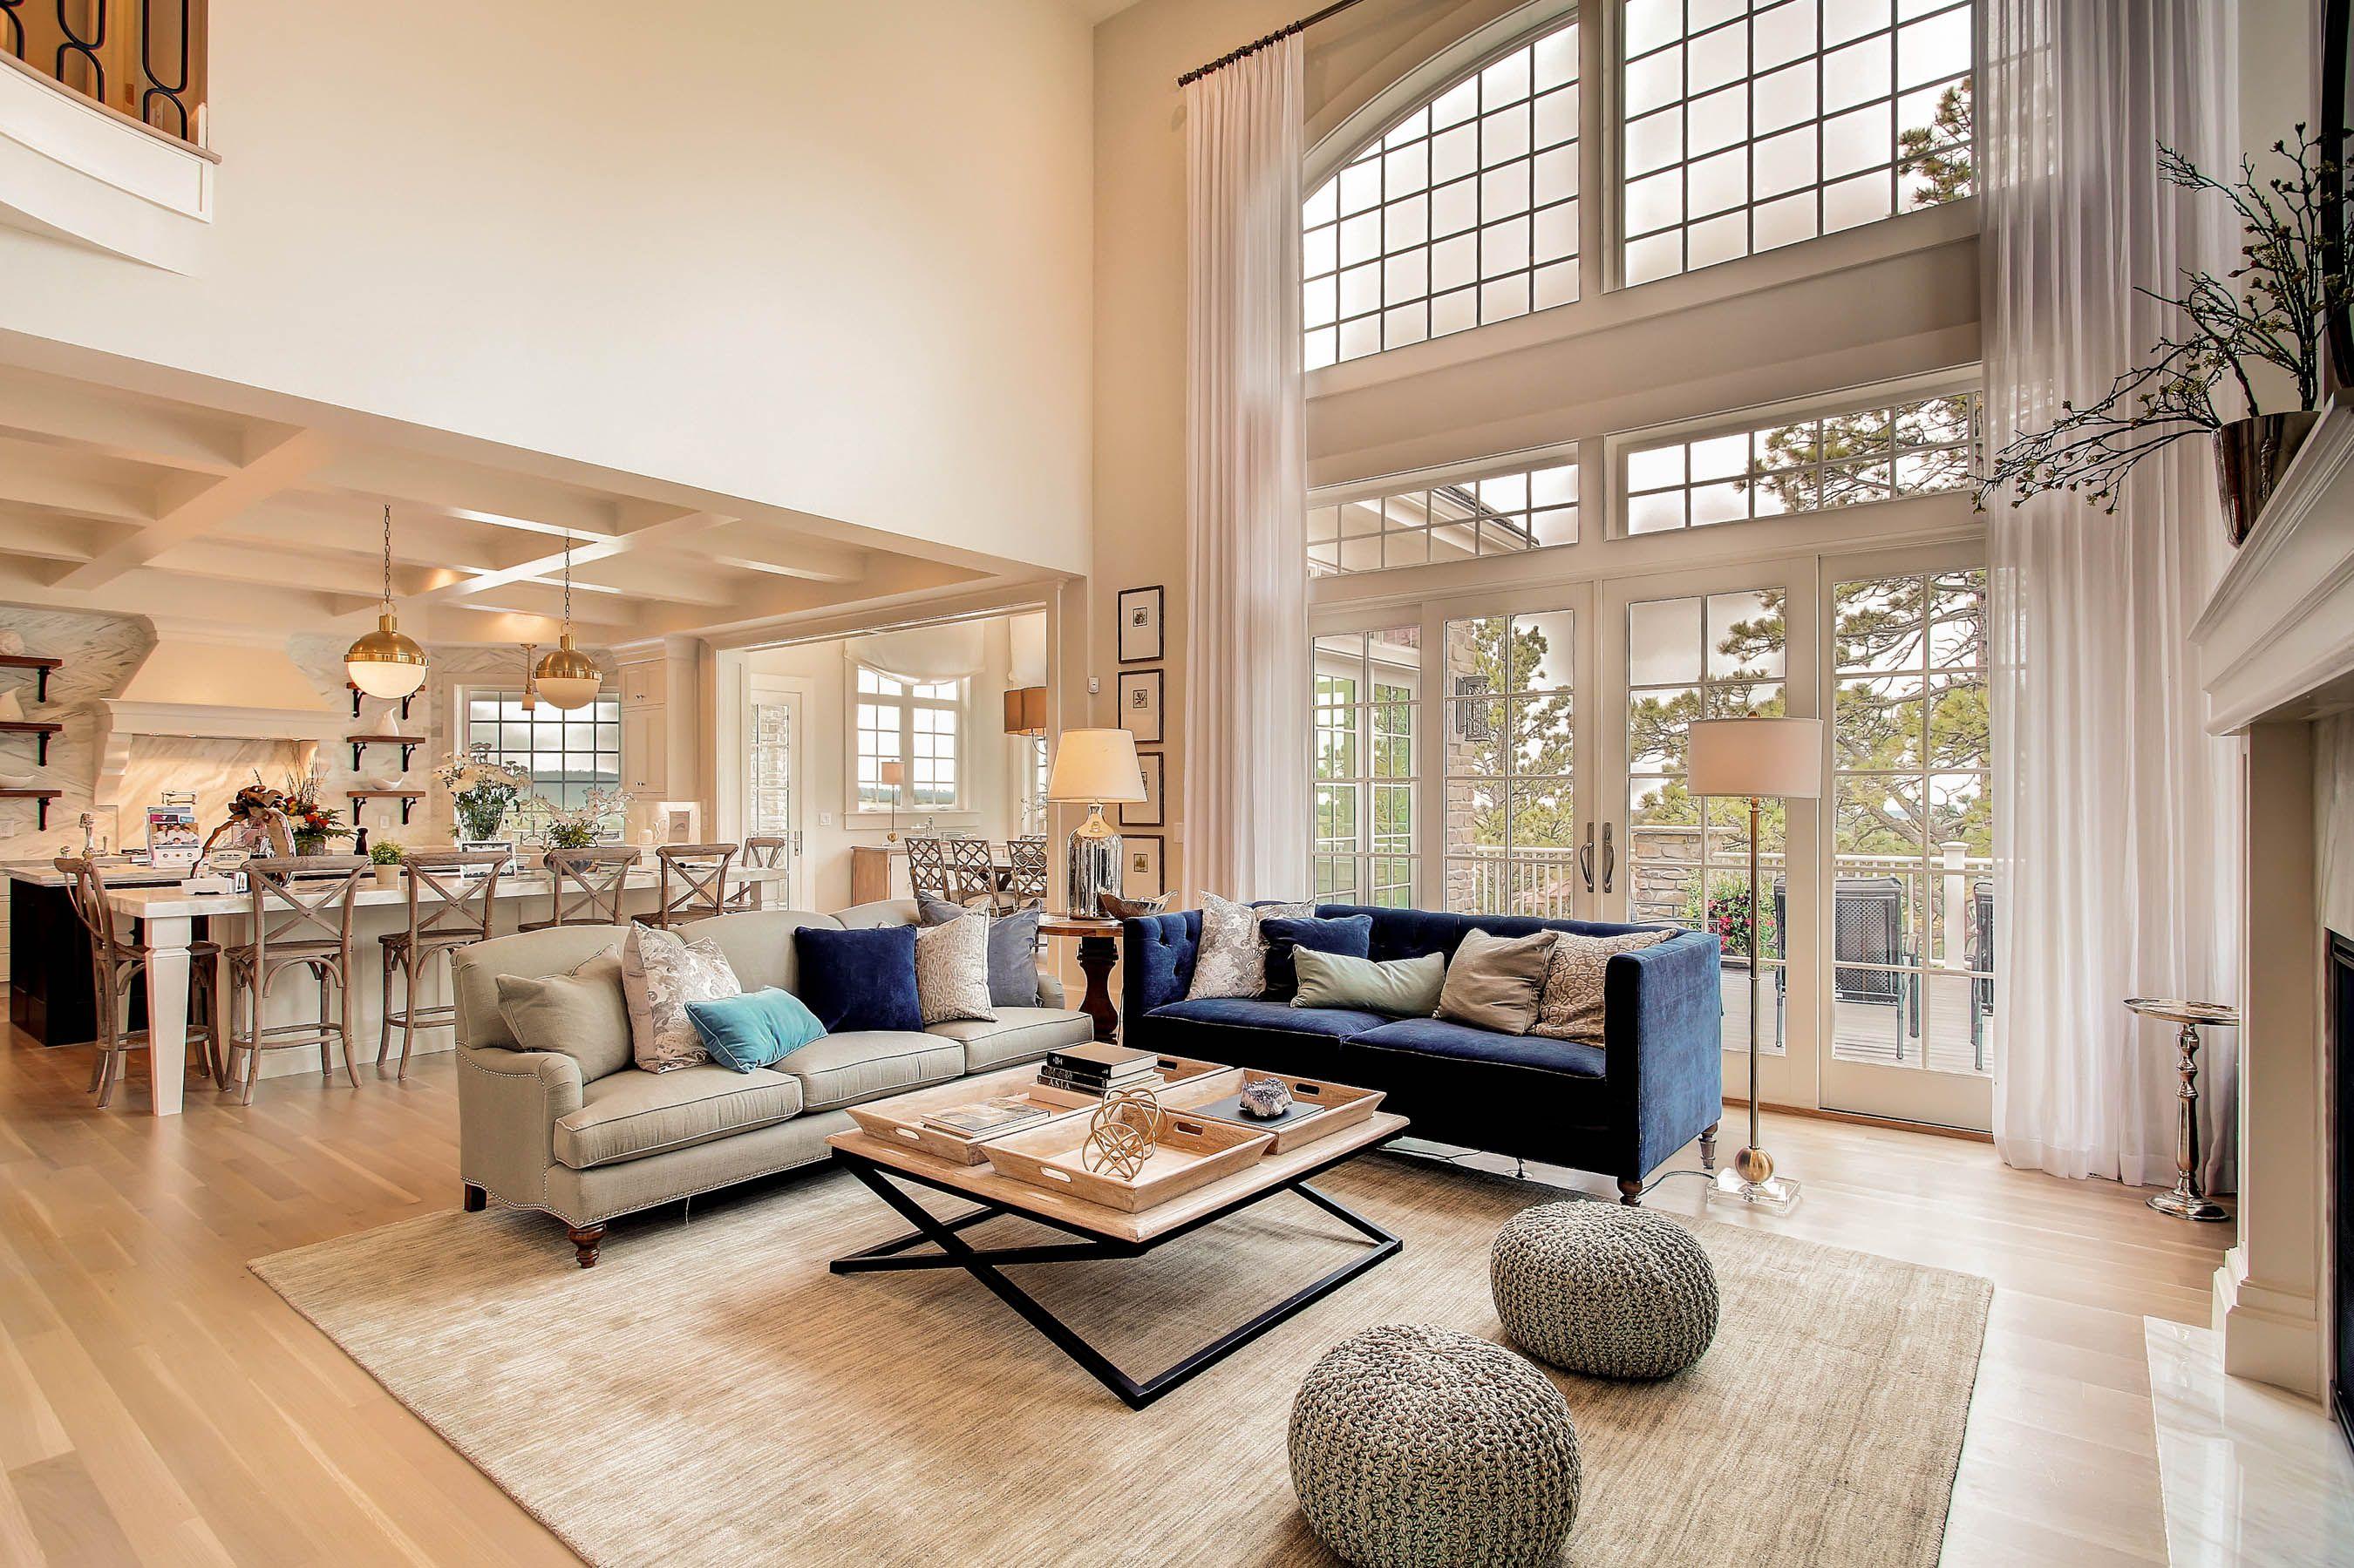 Family Room With 20 Ft Ceilings  White Wash Oak Floors